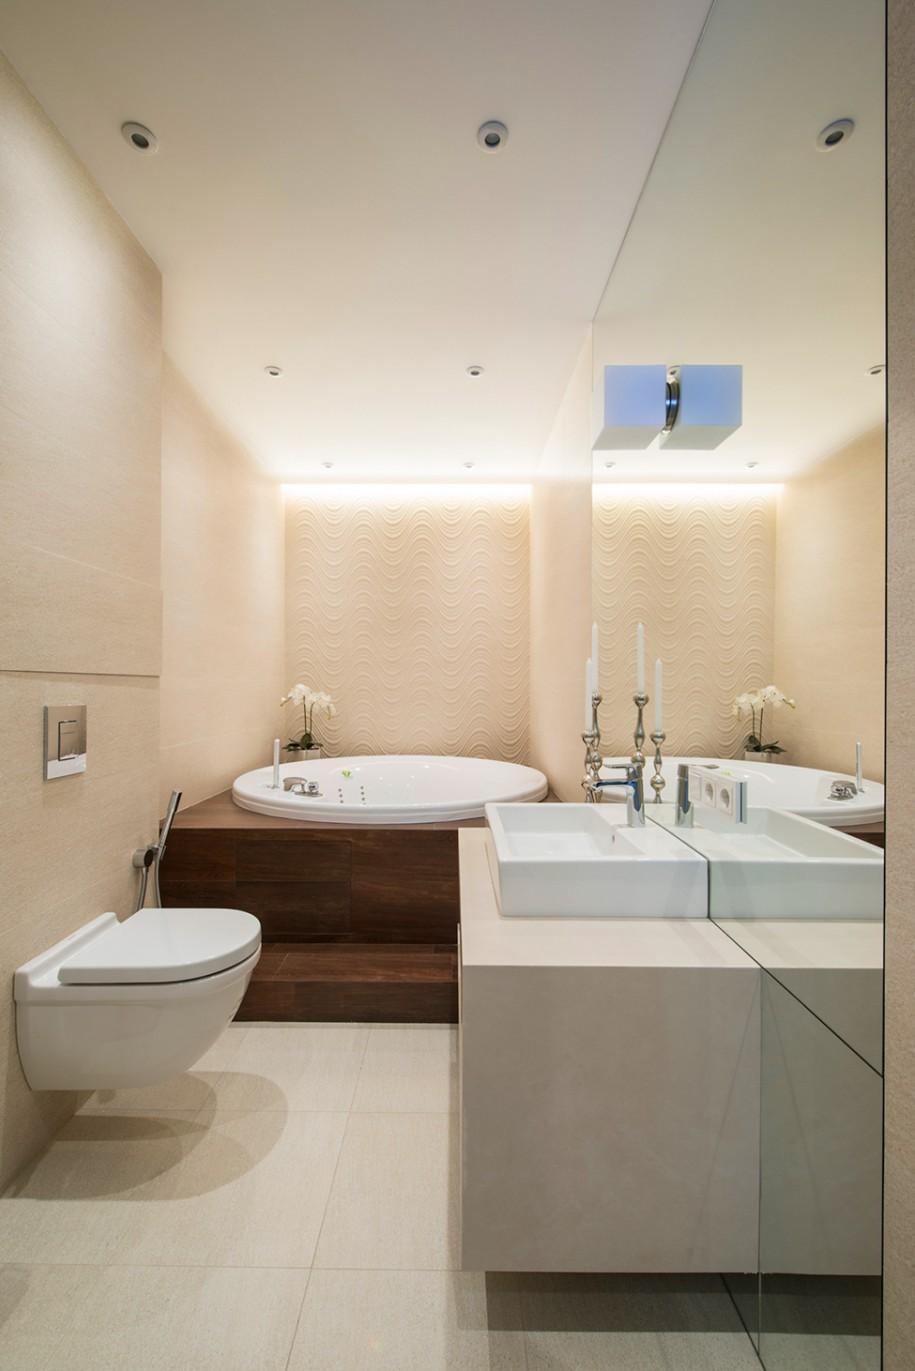 Amazing-Round-Drop-In-Tub-In-Luxury-Small-Bathroom-Design